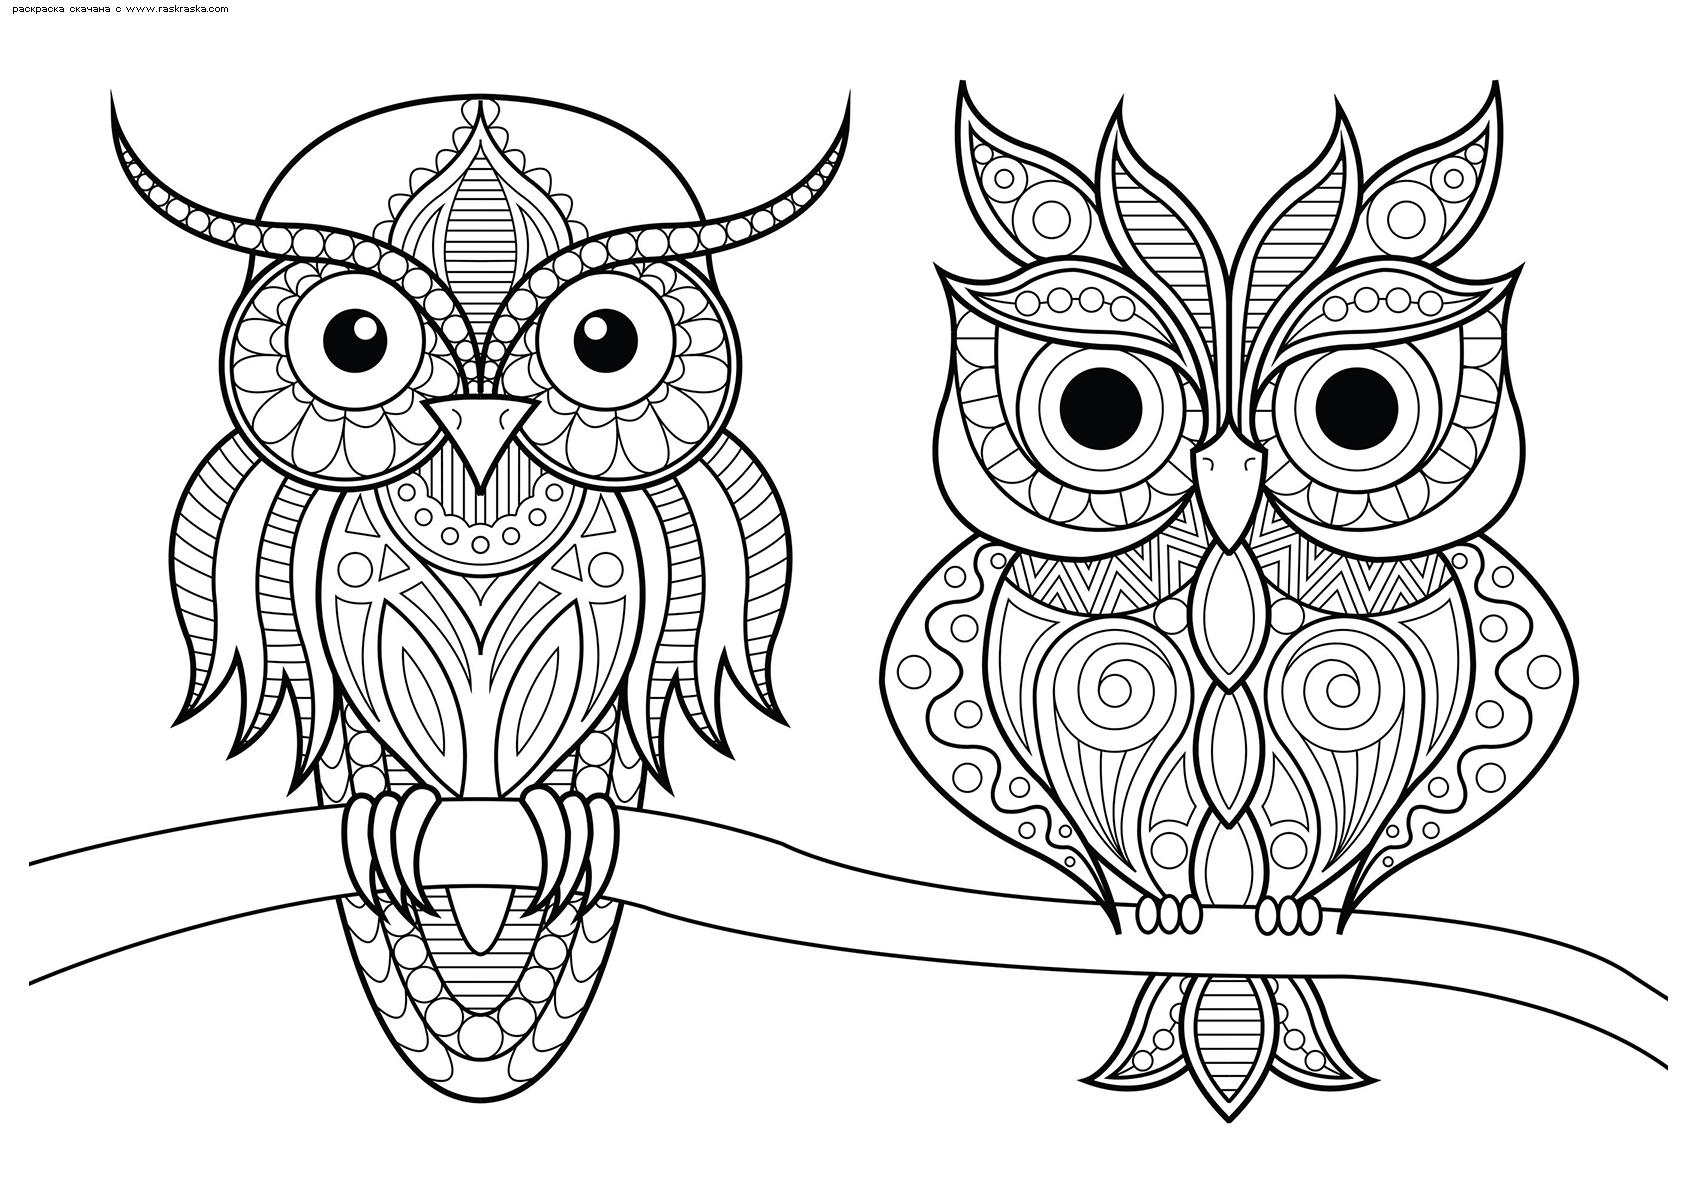 Раскраска Филин и сова на ветке. Раскраска сова, филин, антистресс